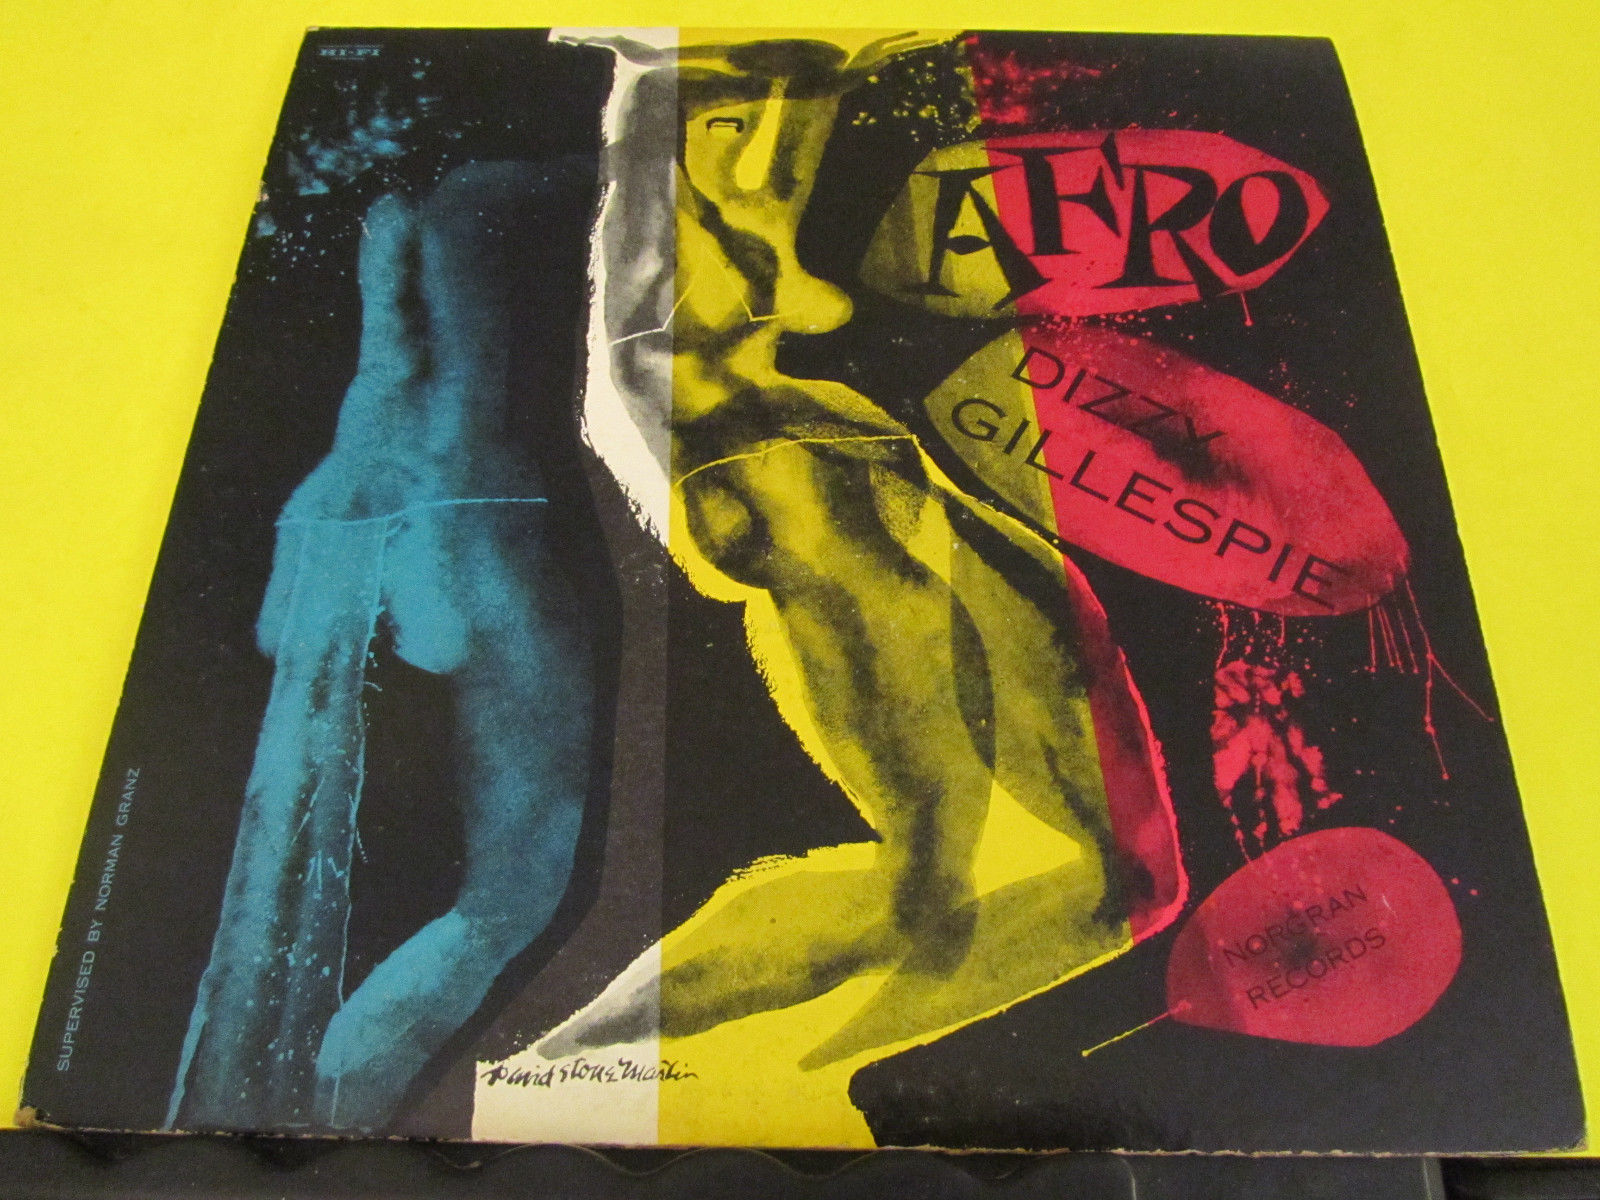 VHTF BEBOP LP Dizzy Gillespie Afro Norgran MG N-1003 DG VG+ / VG+ DSM Cover